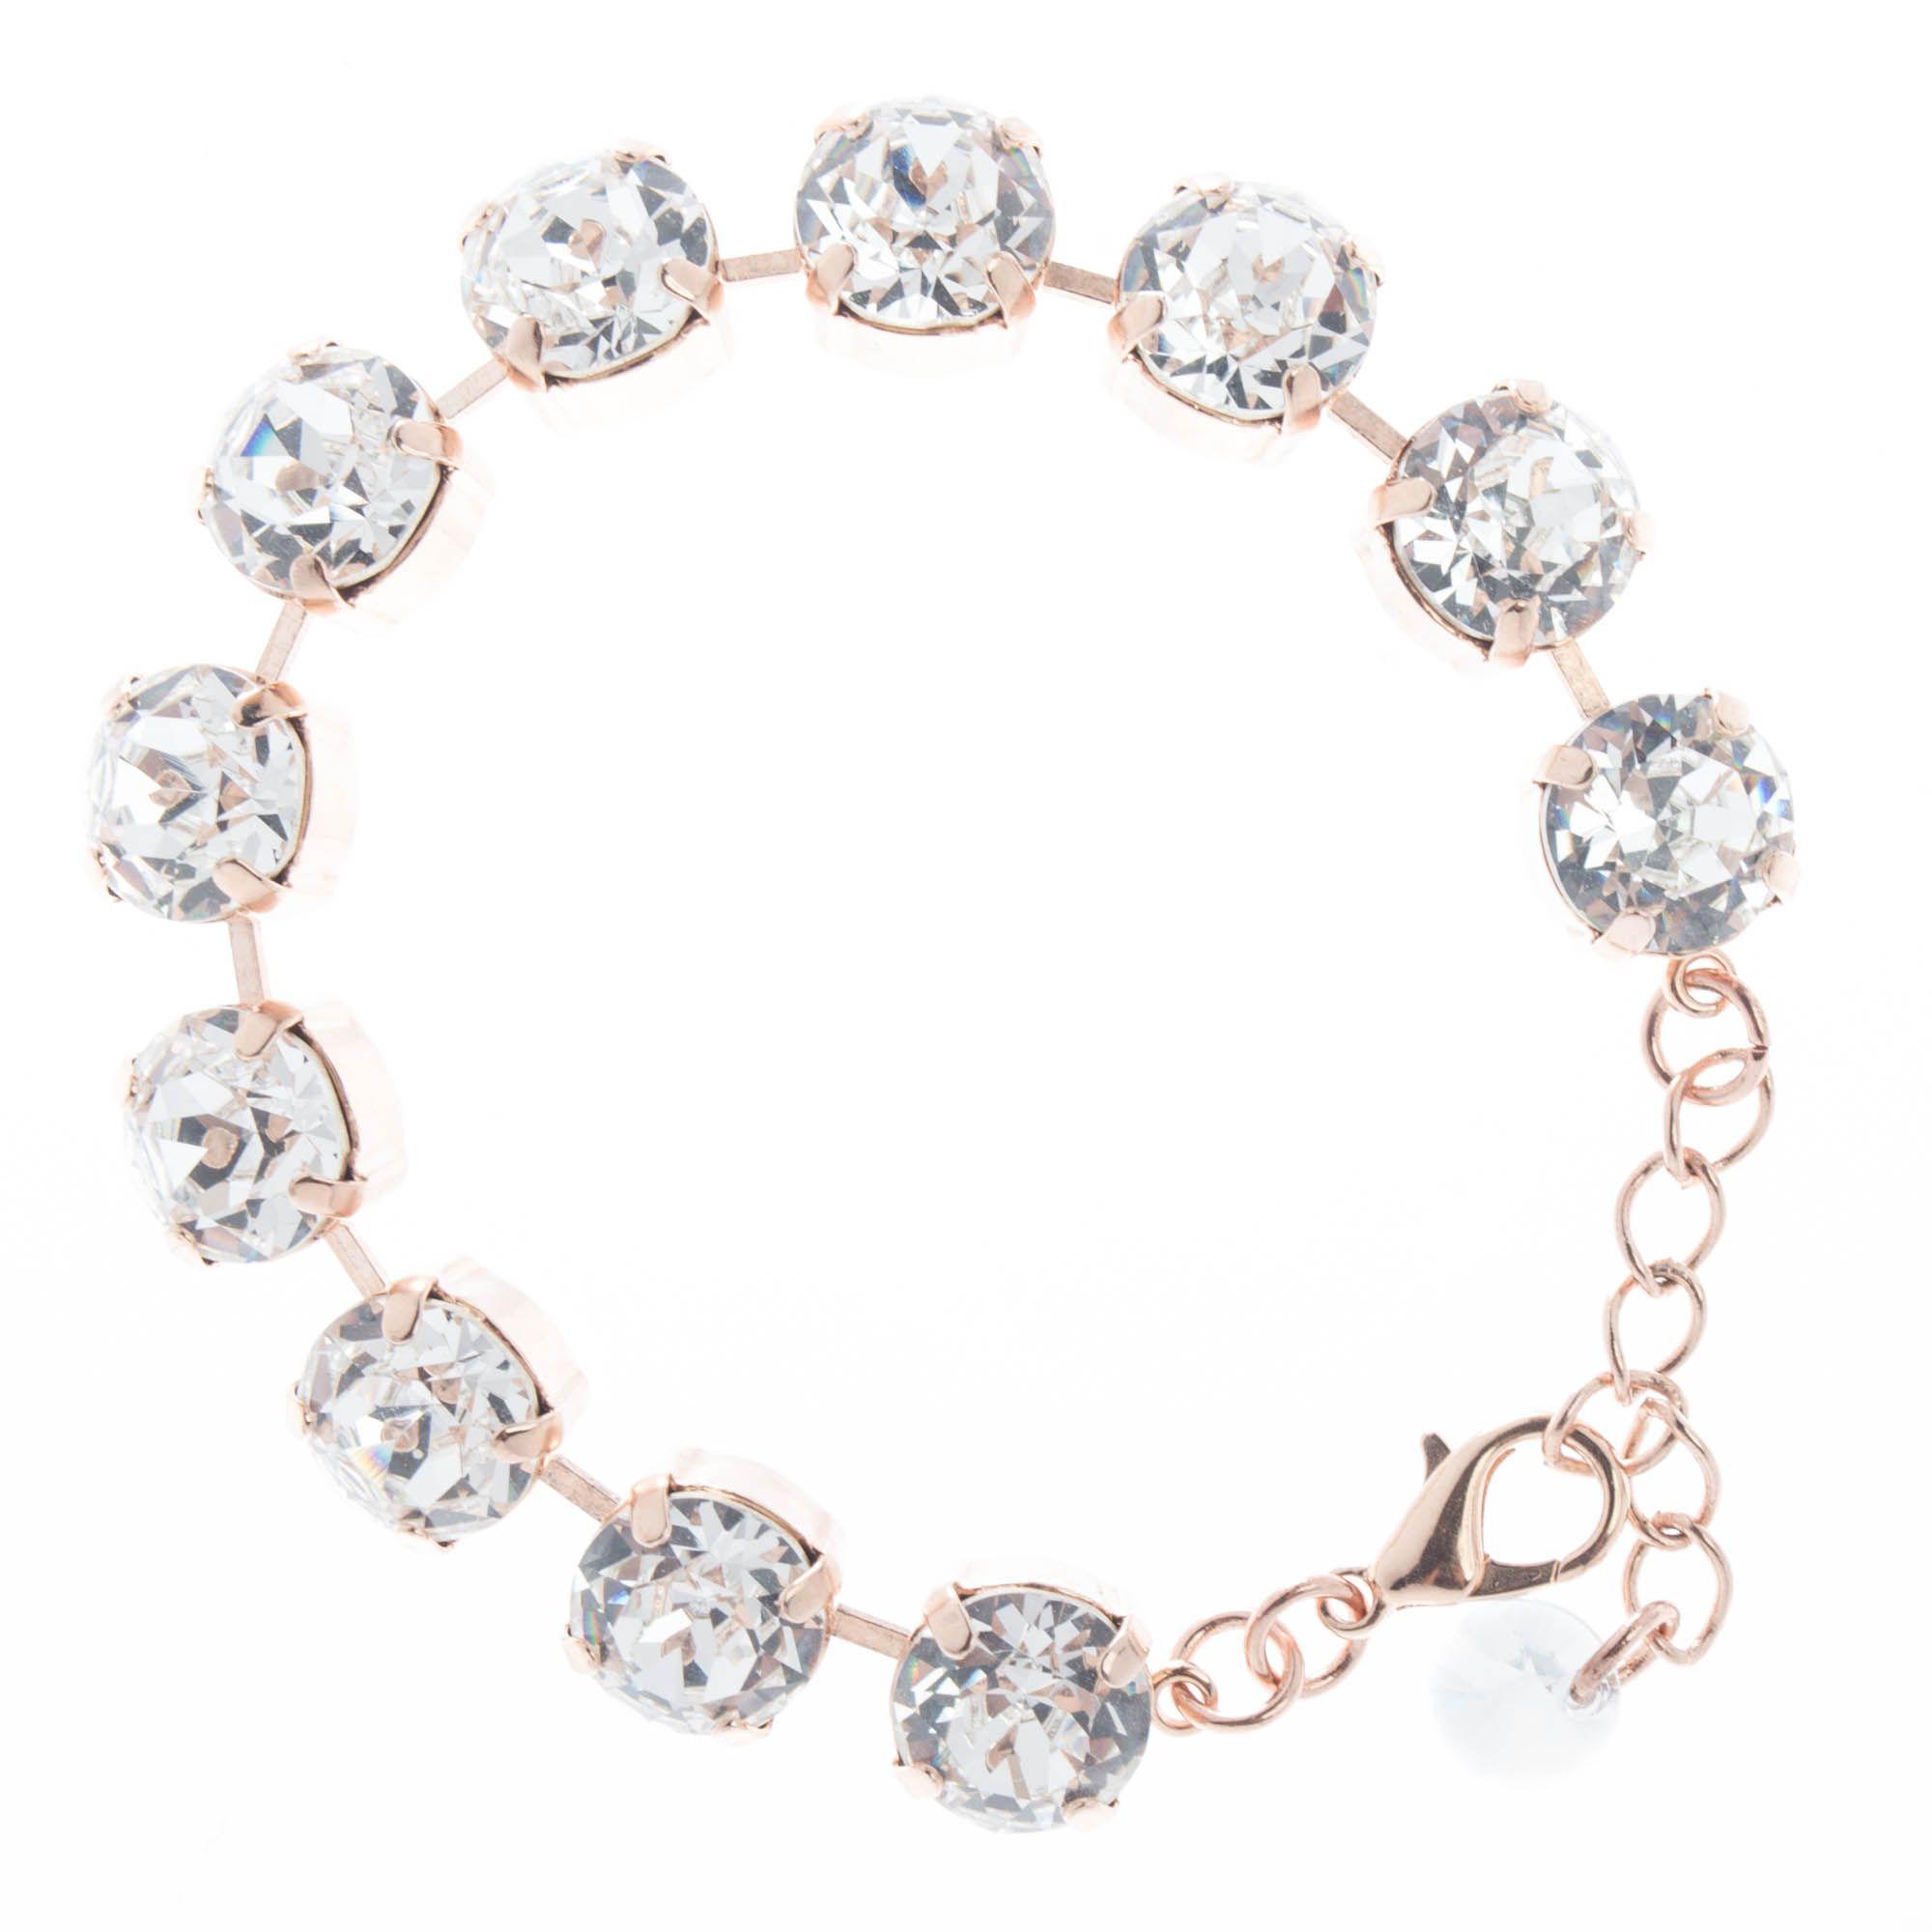 YPMCO 10mm Round Swarovski Crystal Bracelet - Clear & Rose Gold